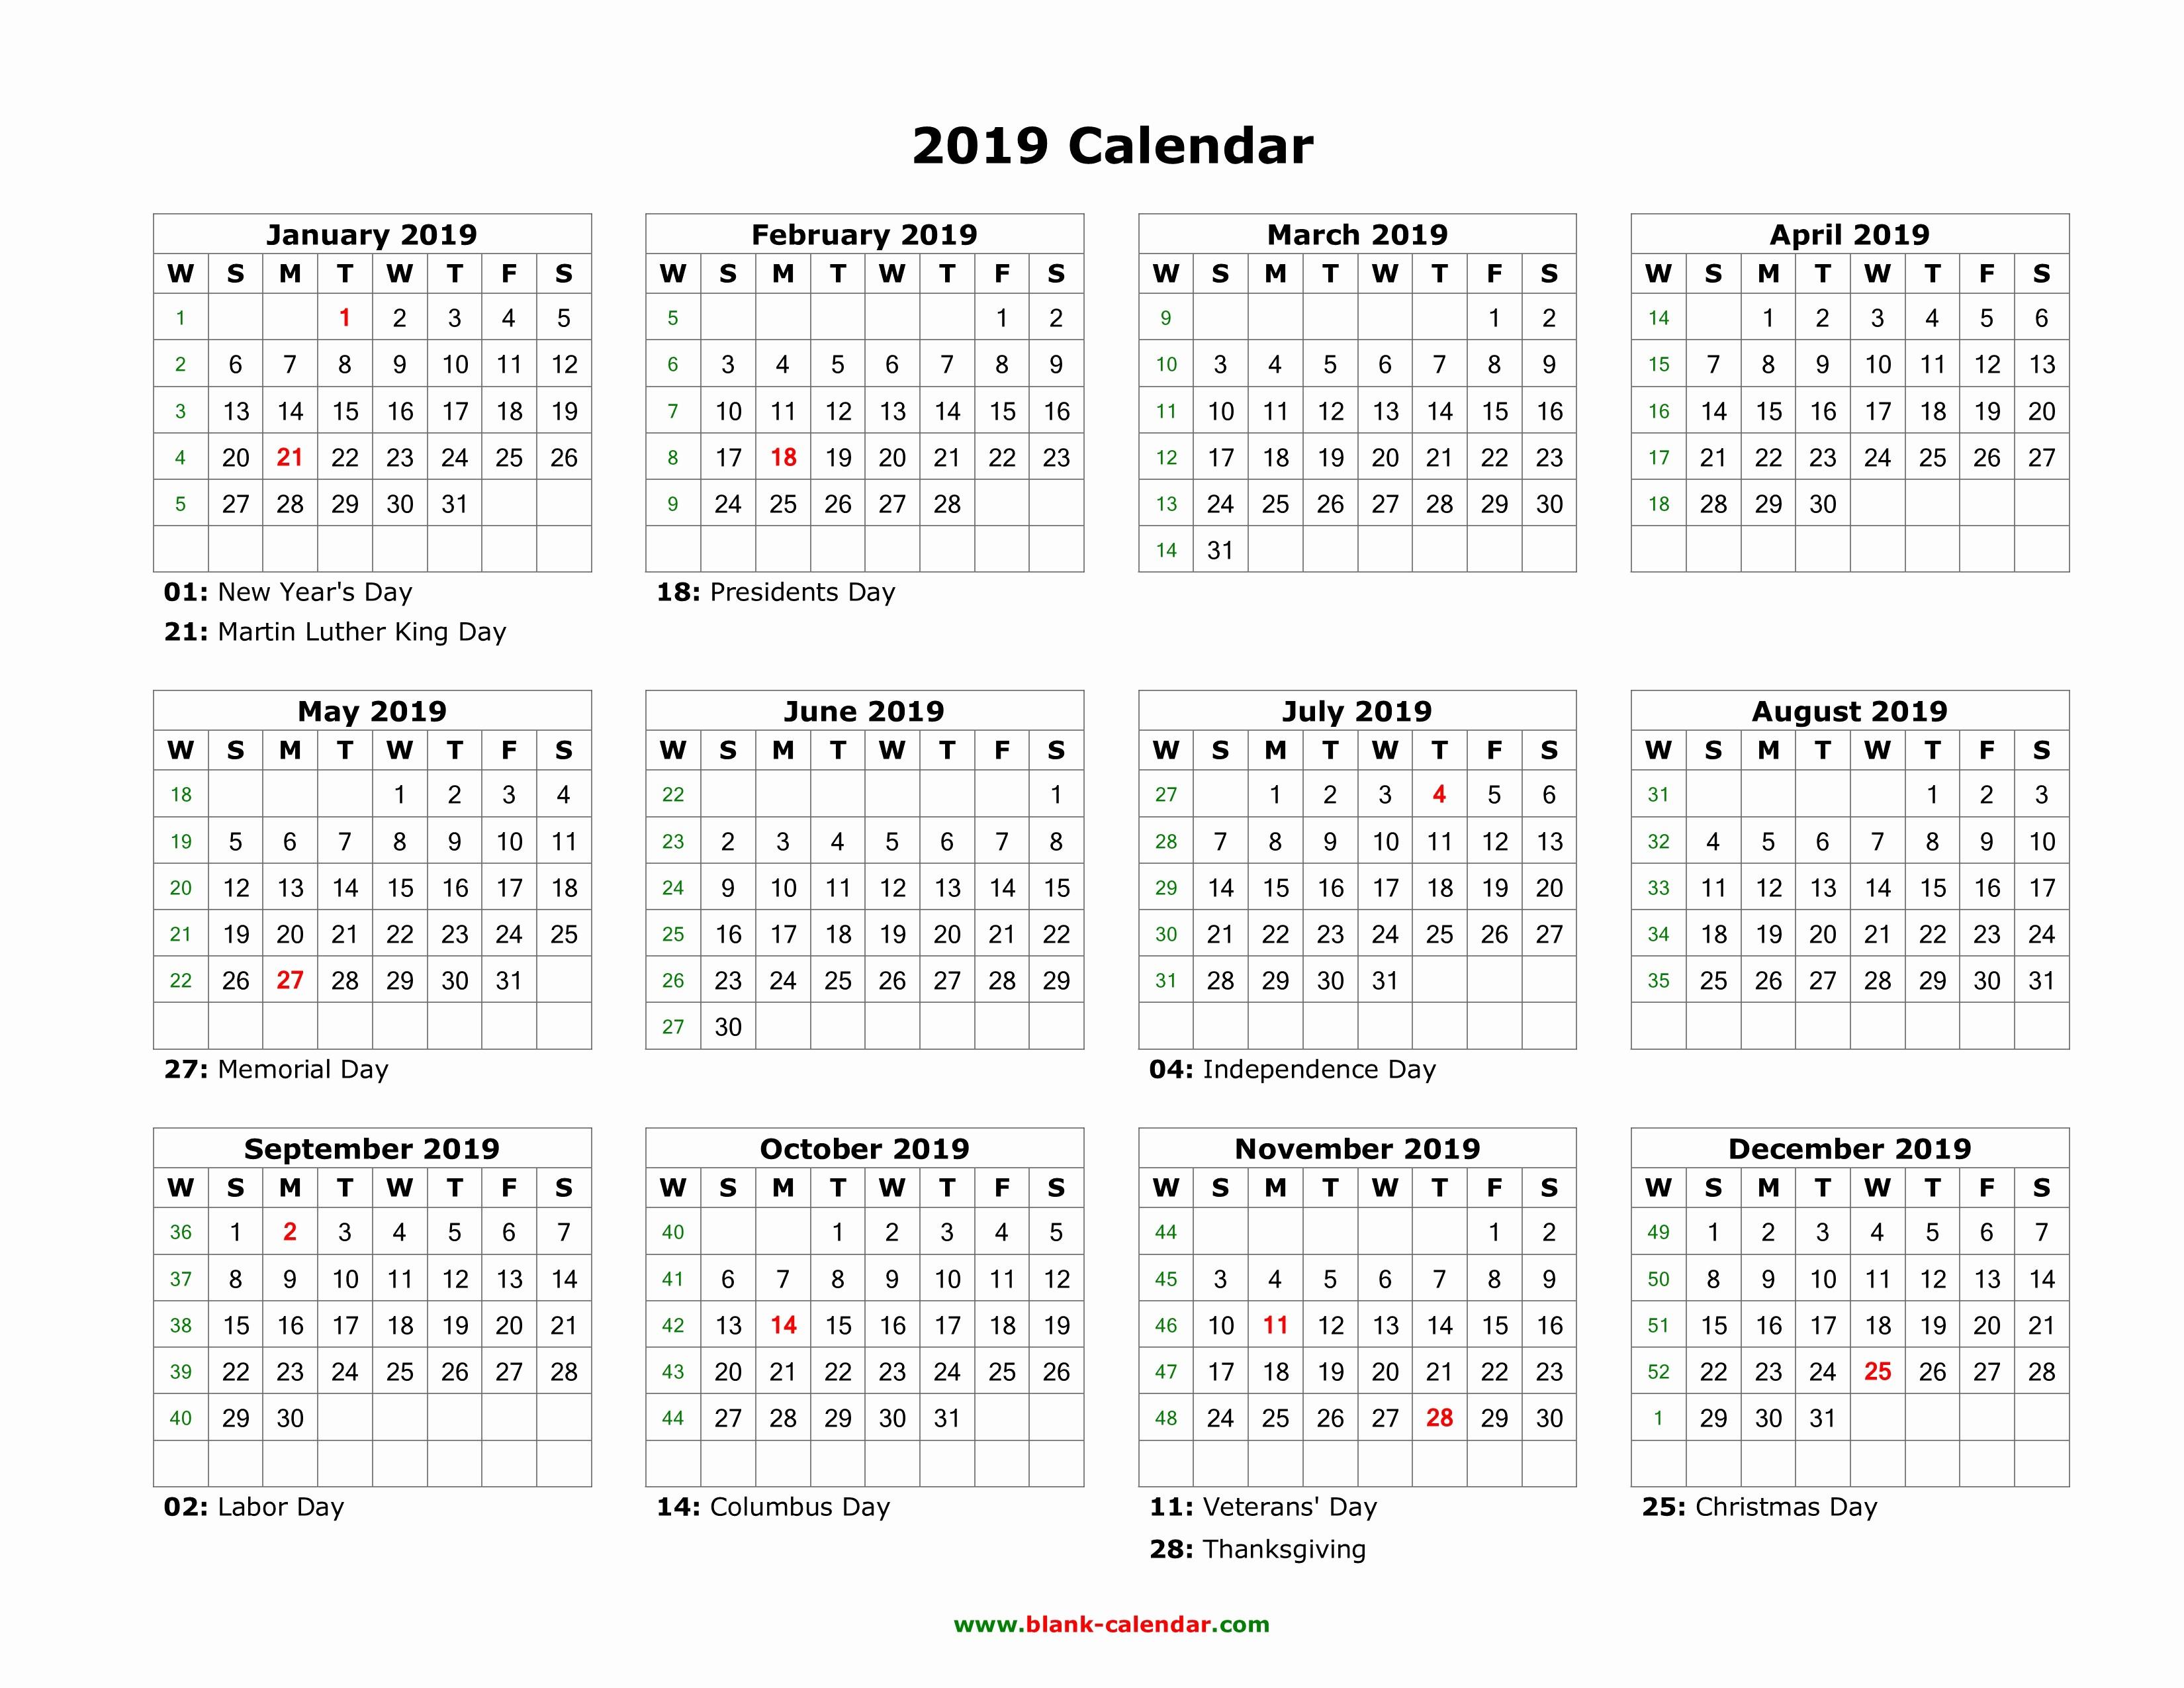 2019 Word Calendar with Holidays Inspirational Download Blank Calendar 2019 with Us Holidays 12 Months